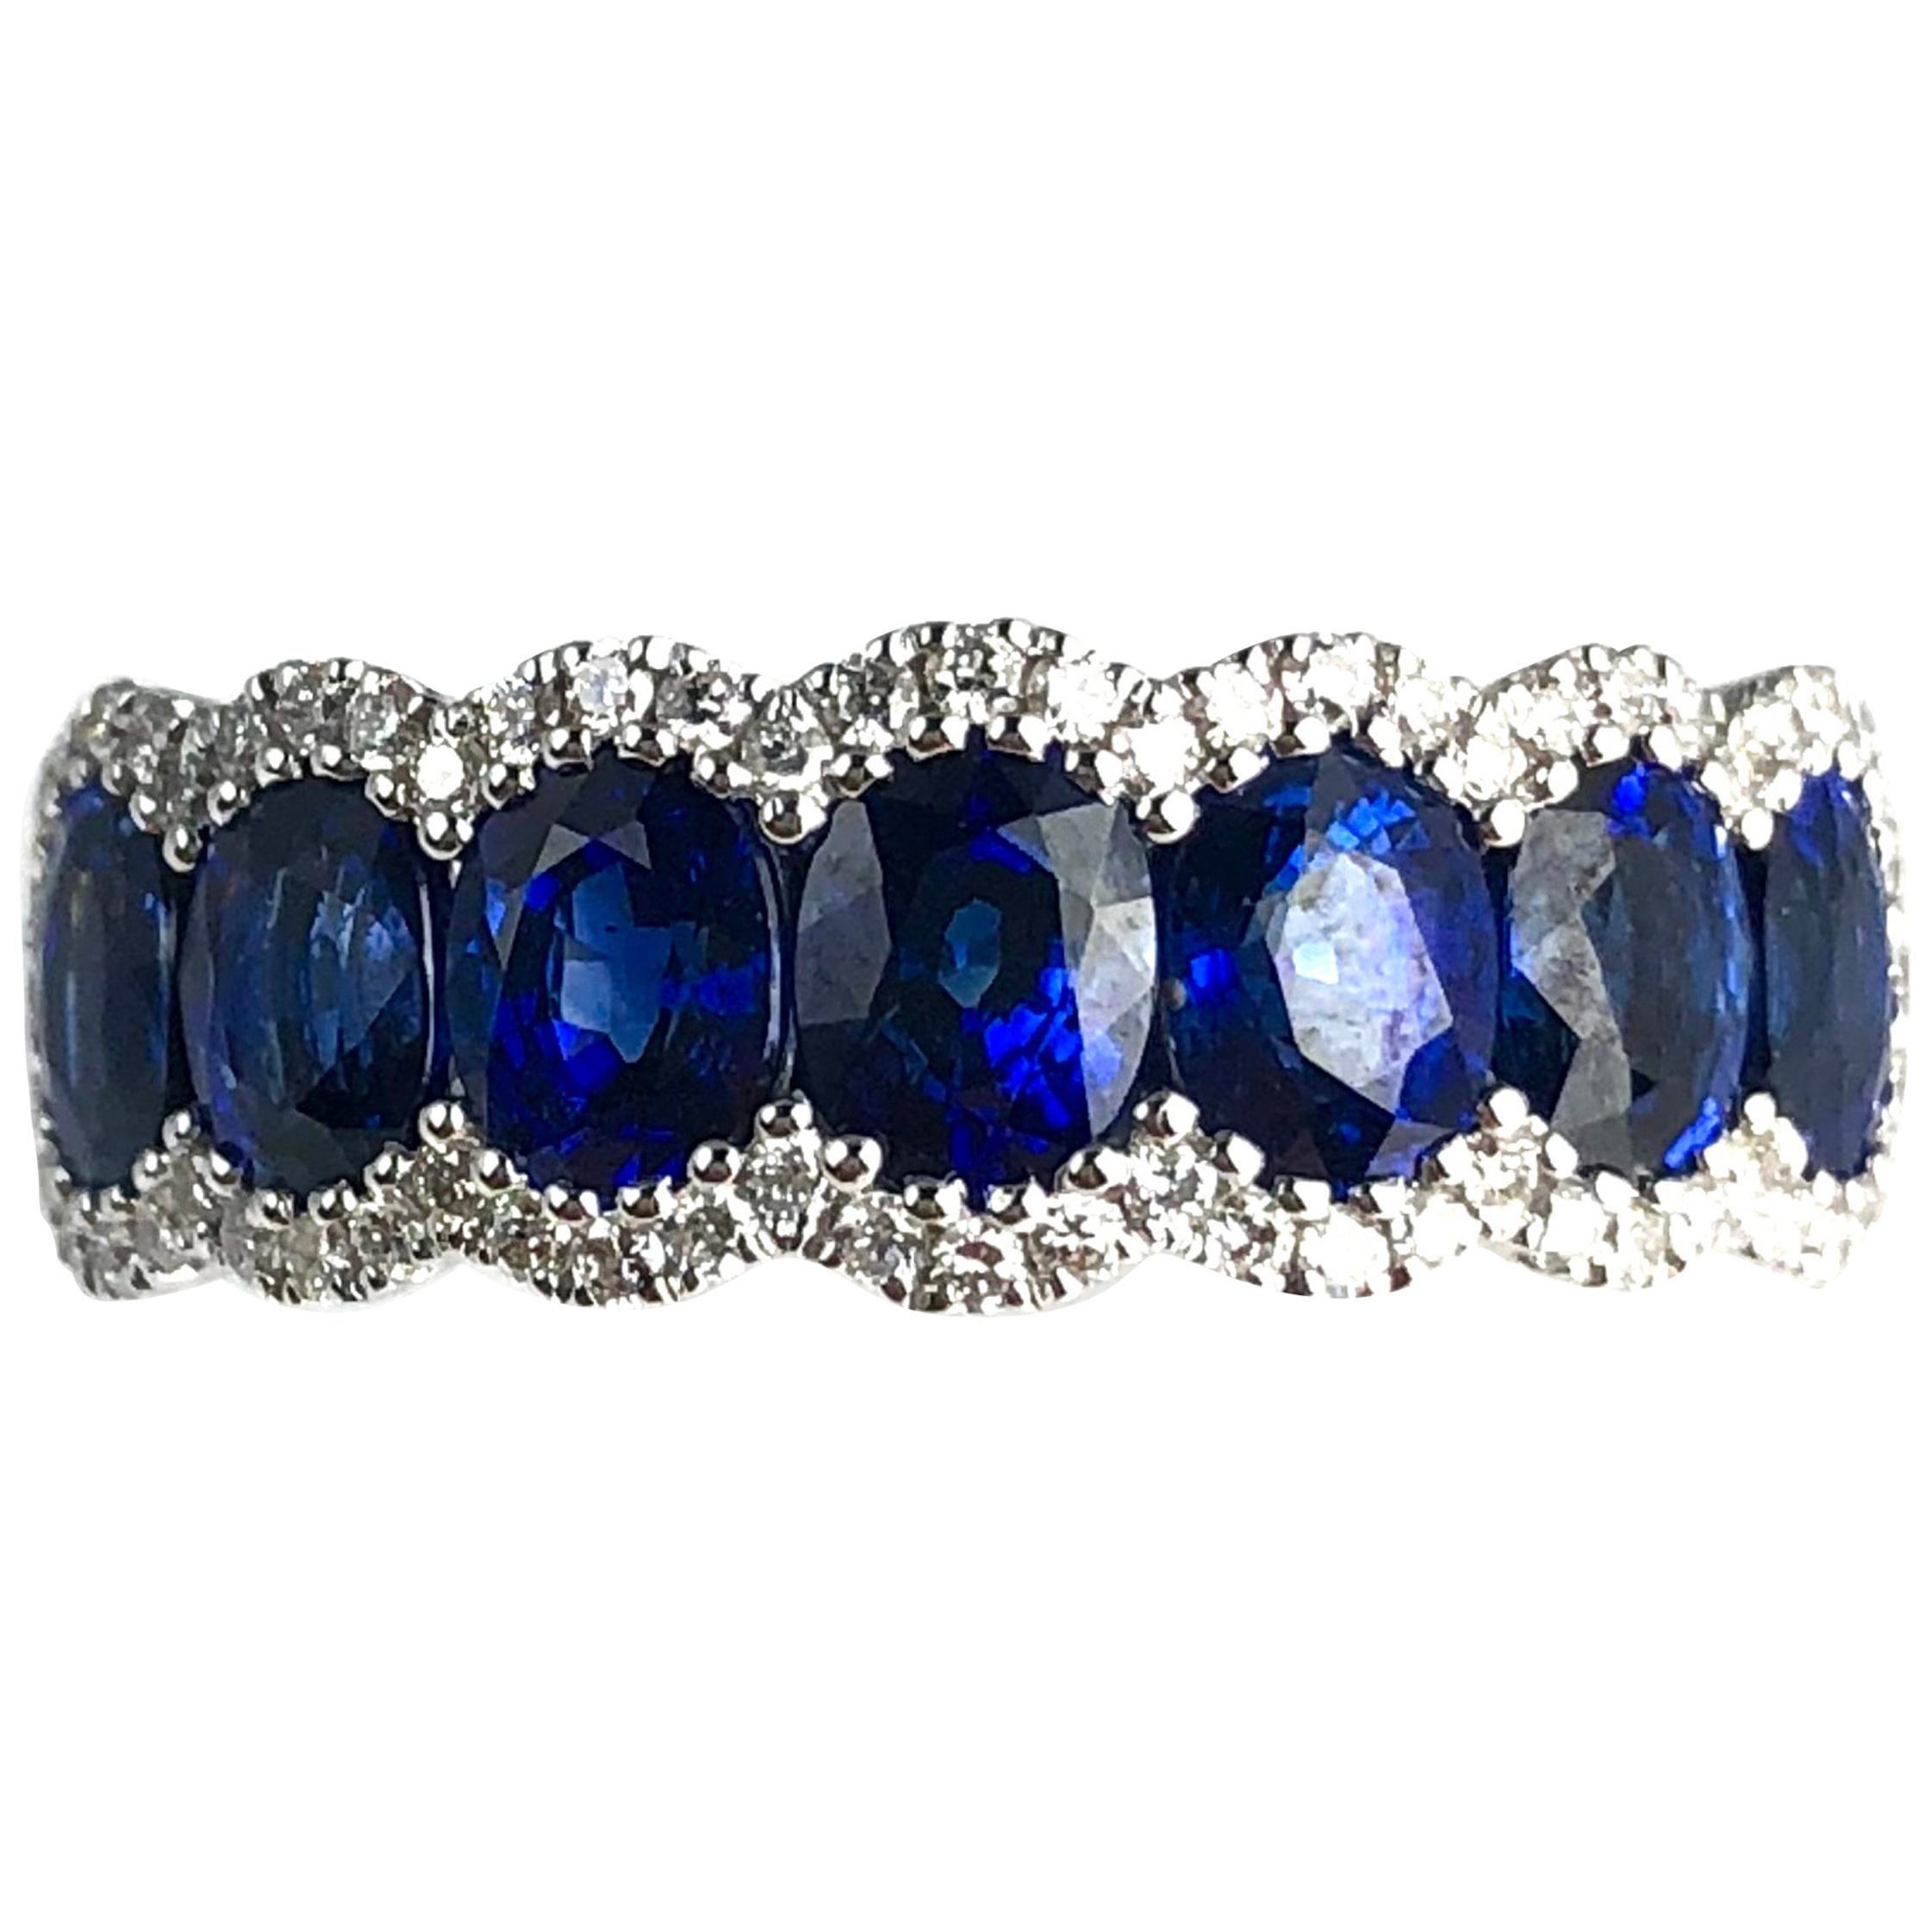 DiamondTown 2.76 Carat Vivid Blue Sapphire and Diamond Ring in 18 Karat Gold